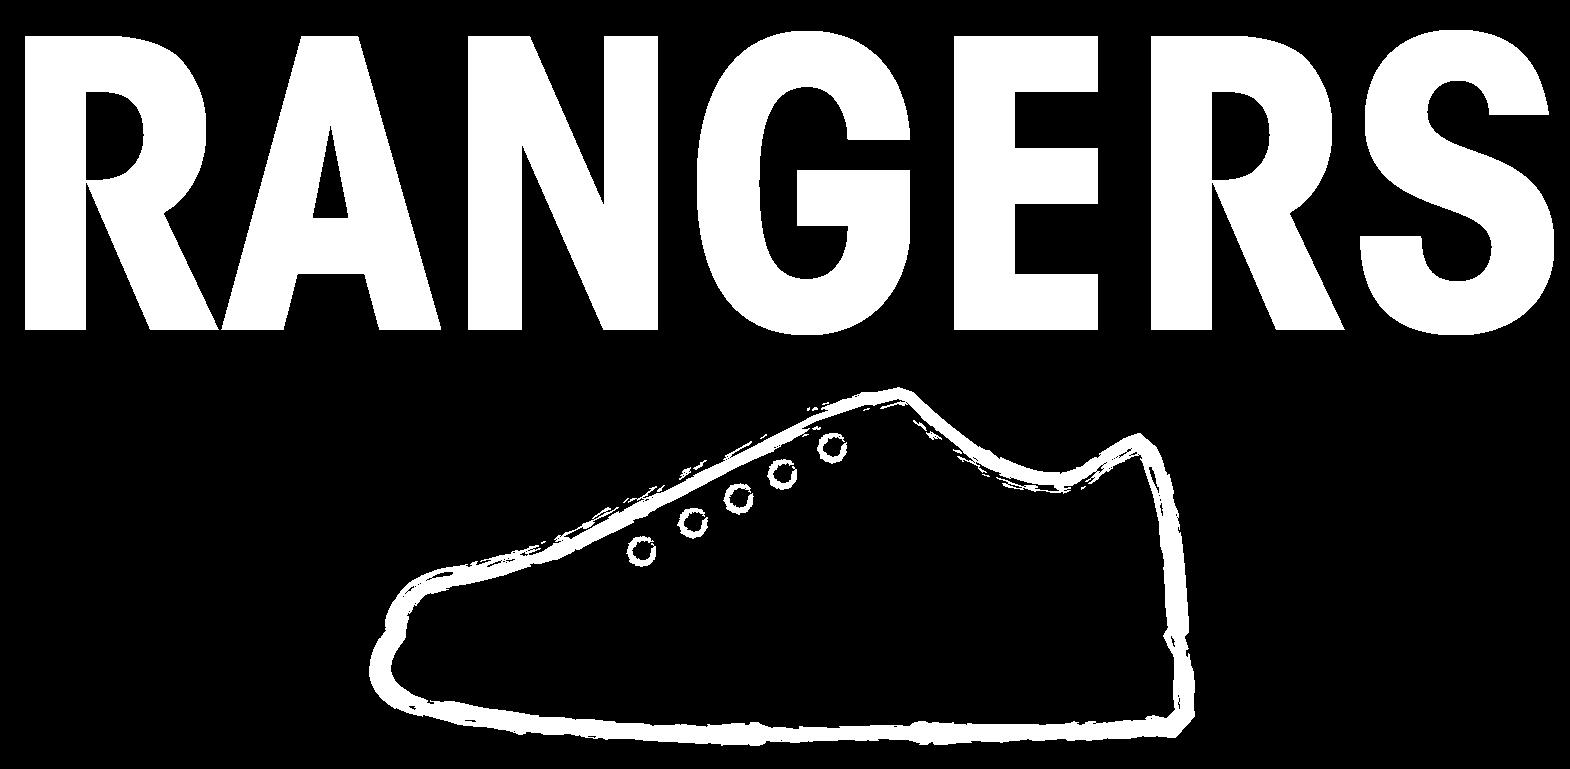 RANGERSSHOES